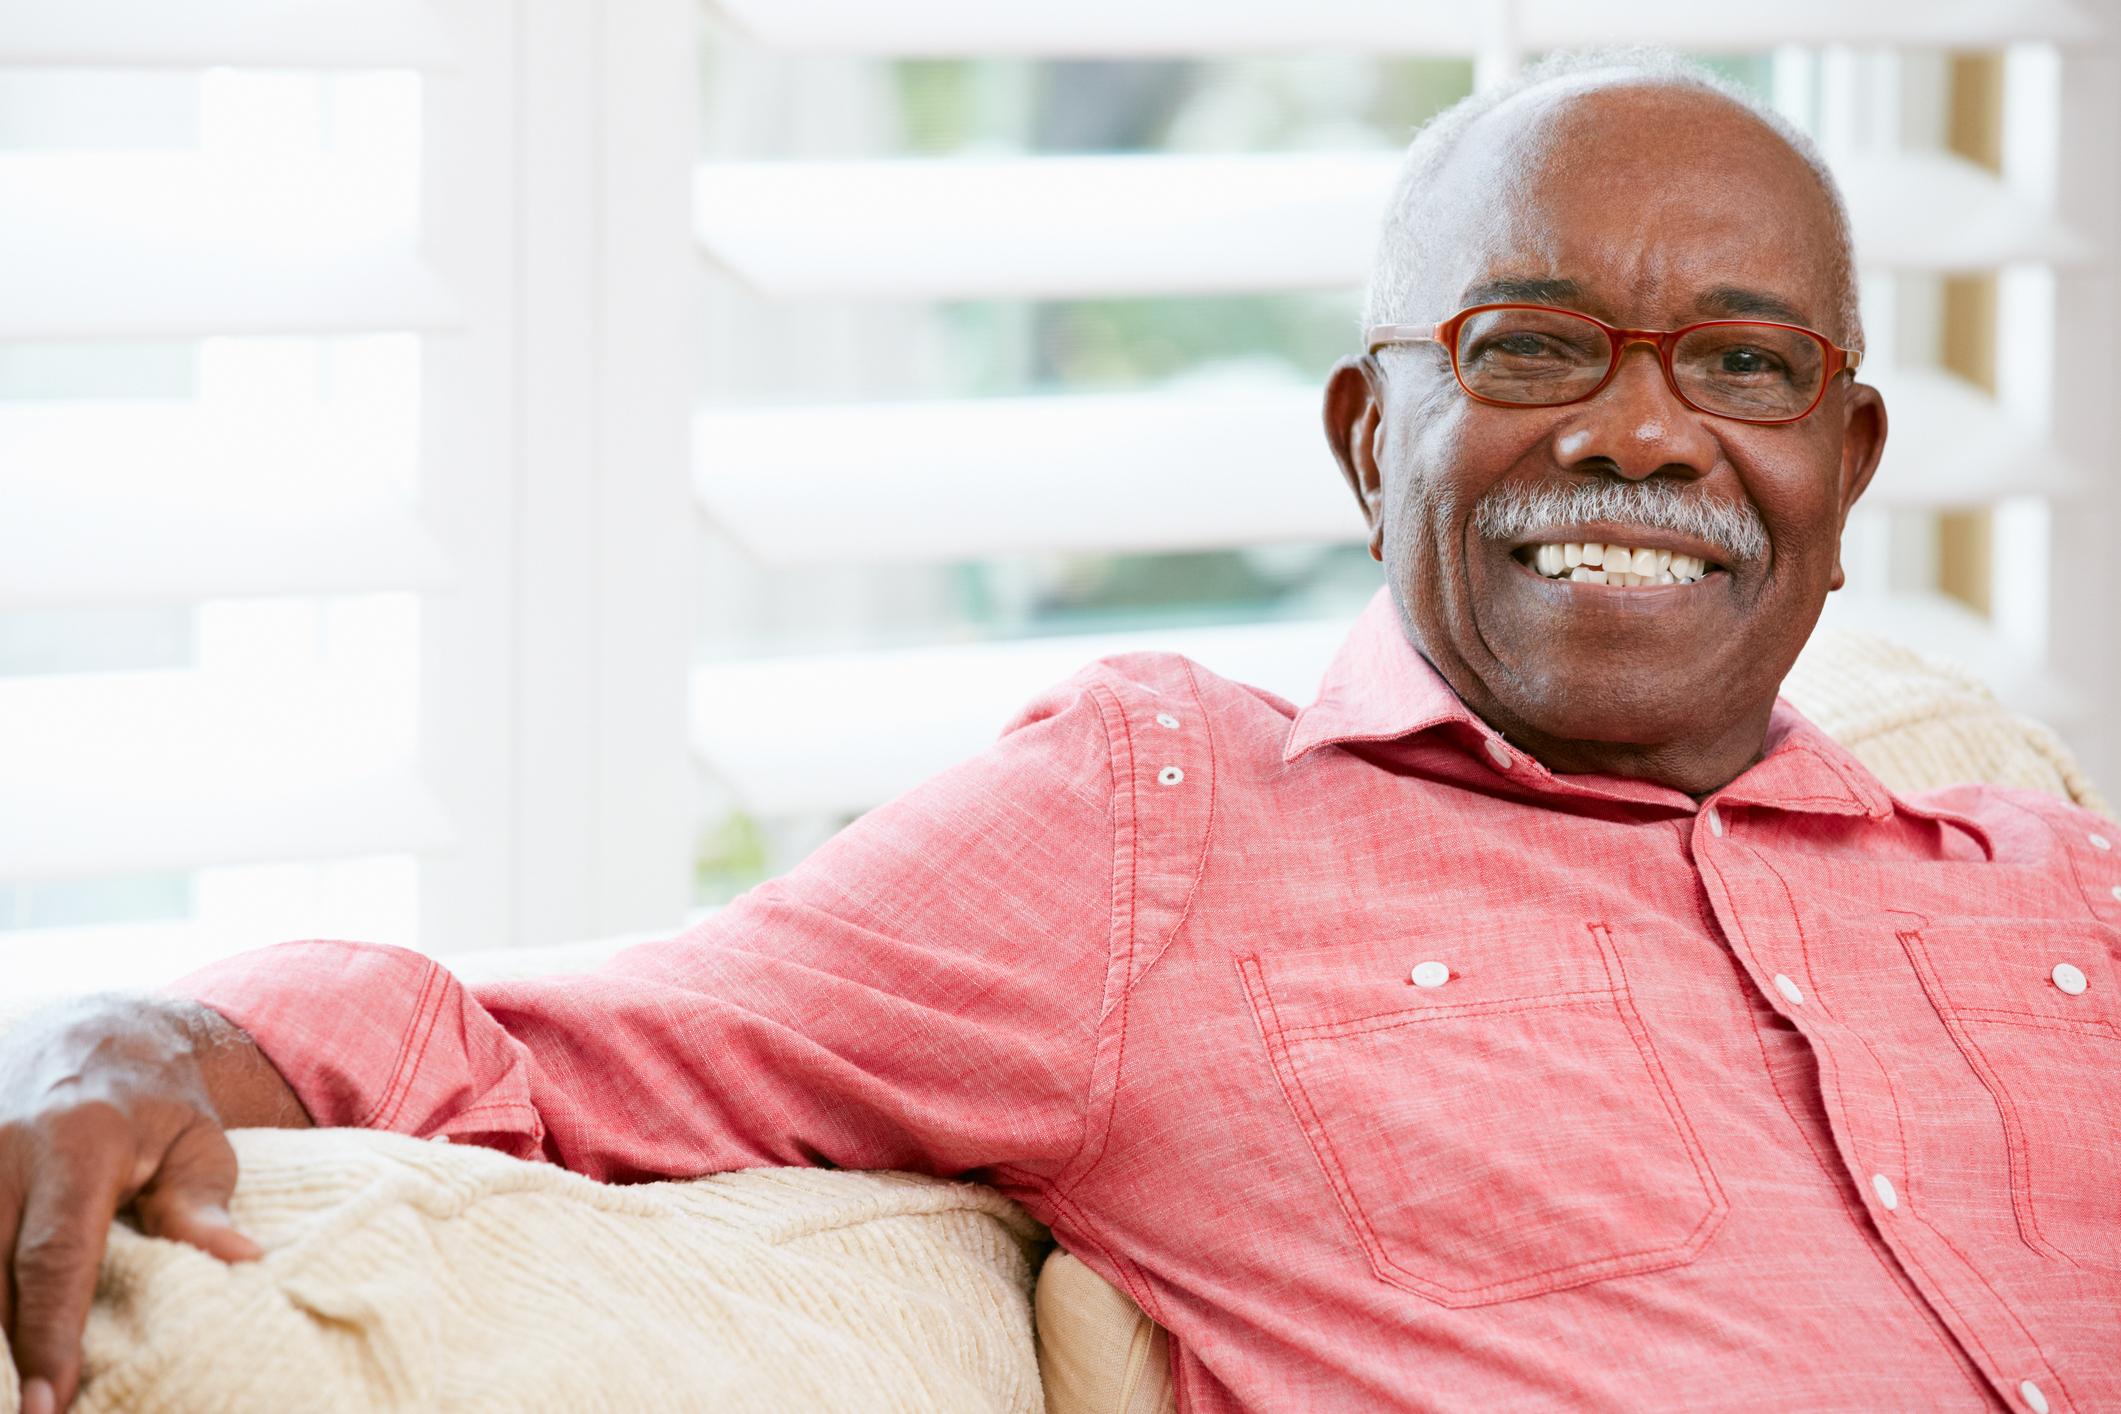 African American Senior Citizen Man